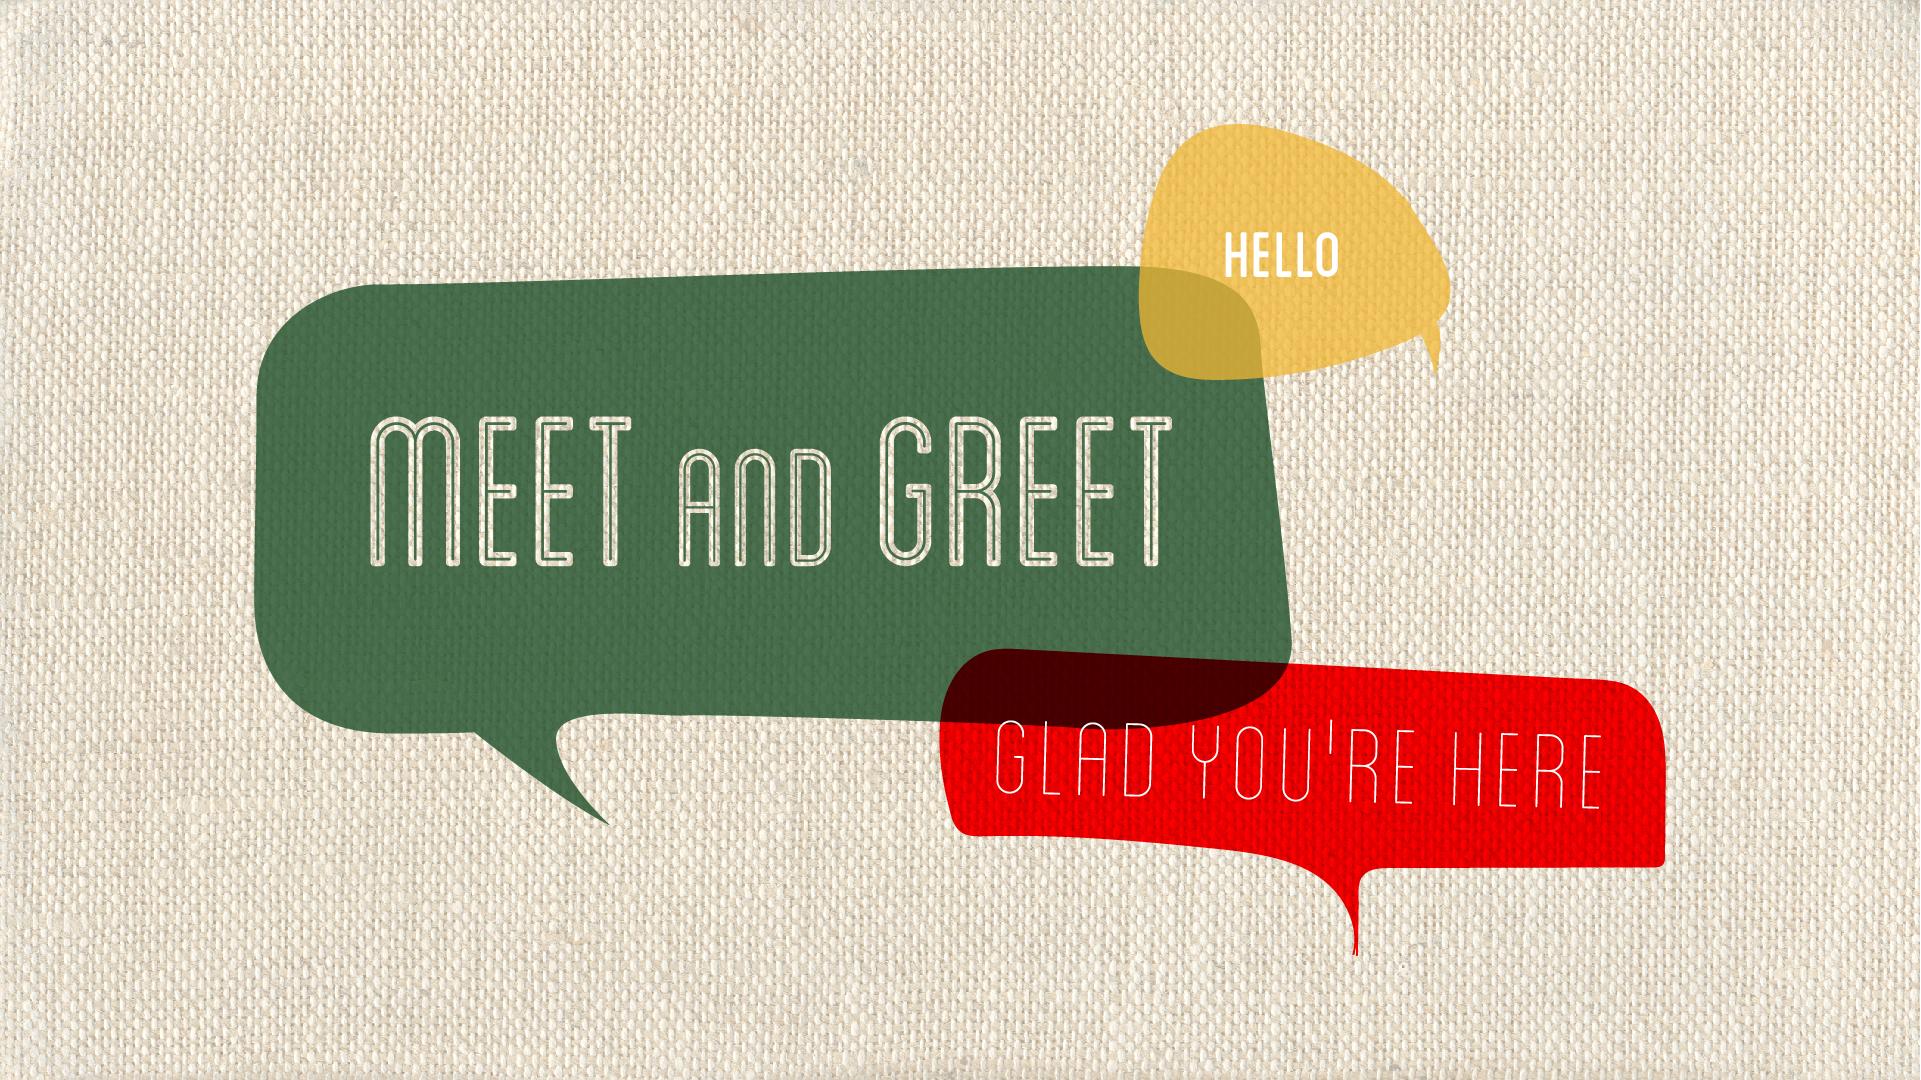 Meet and greet 01